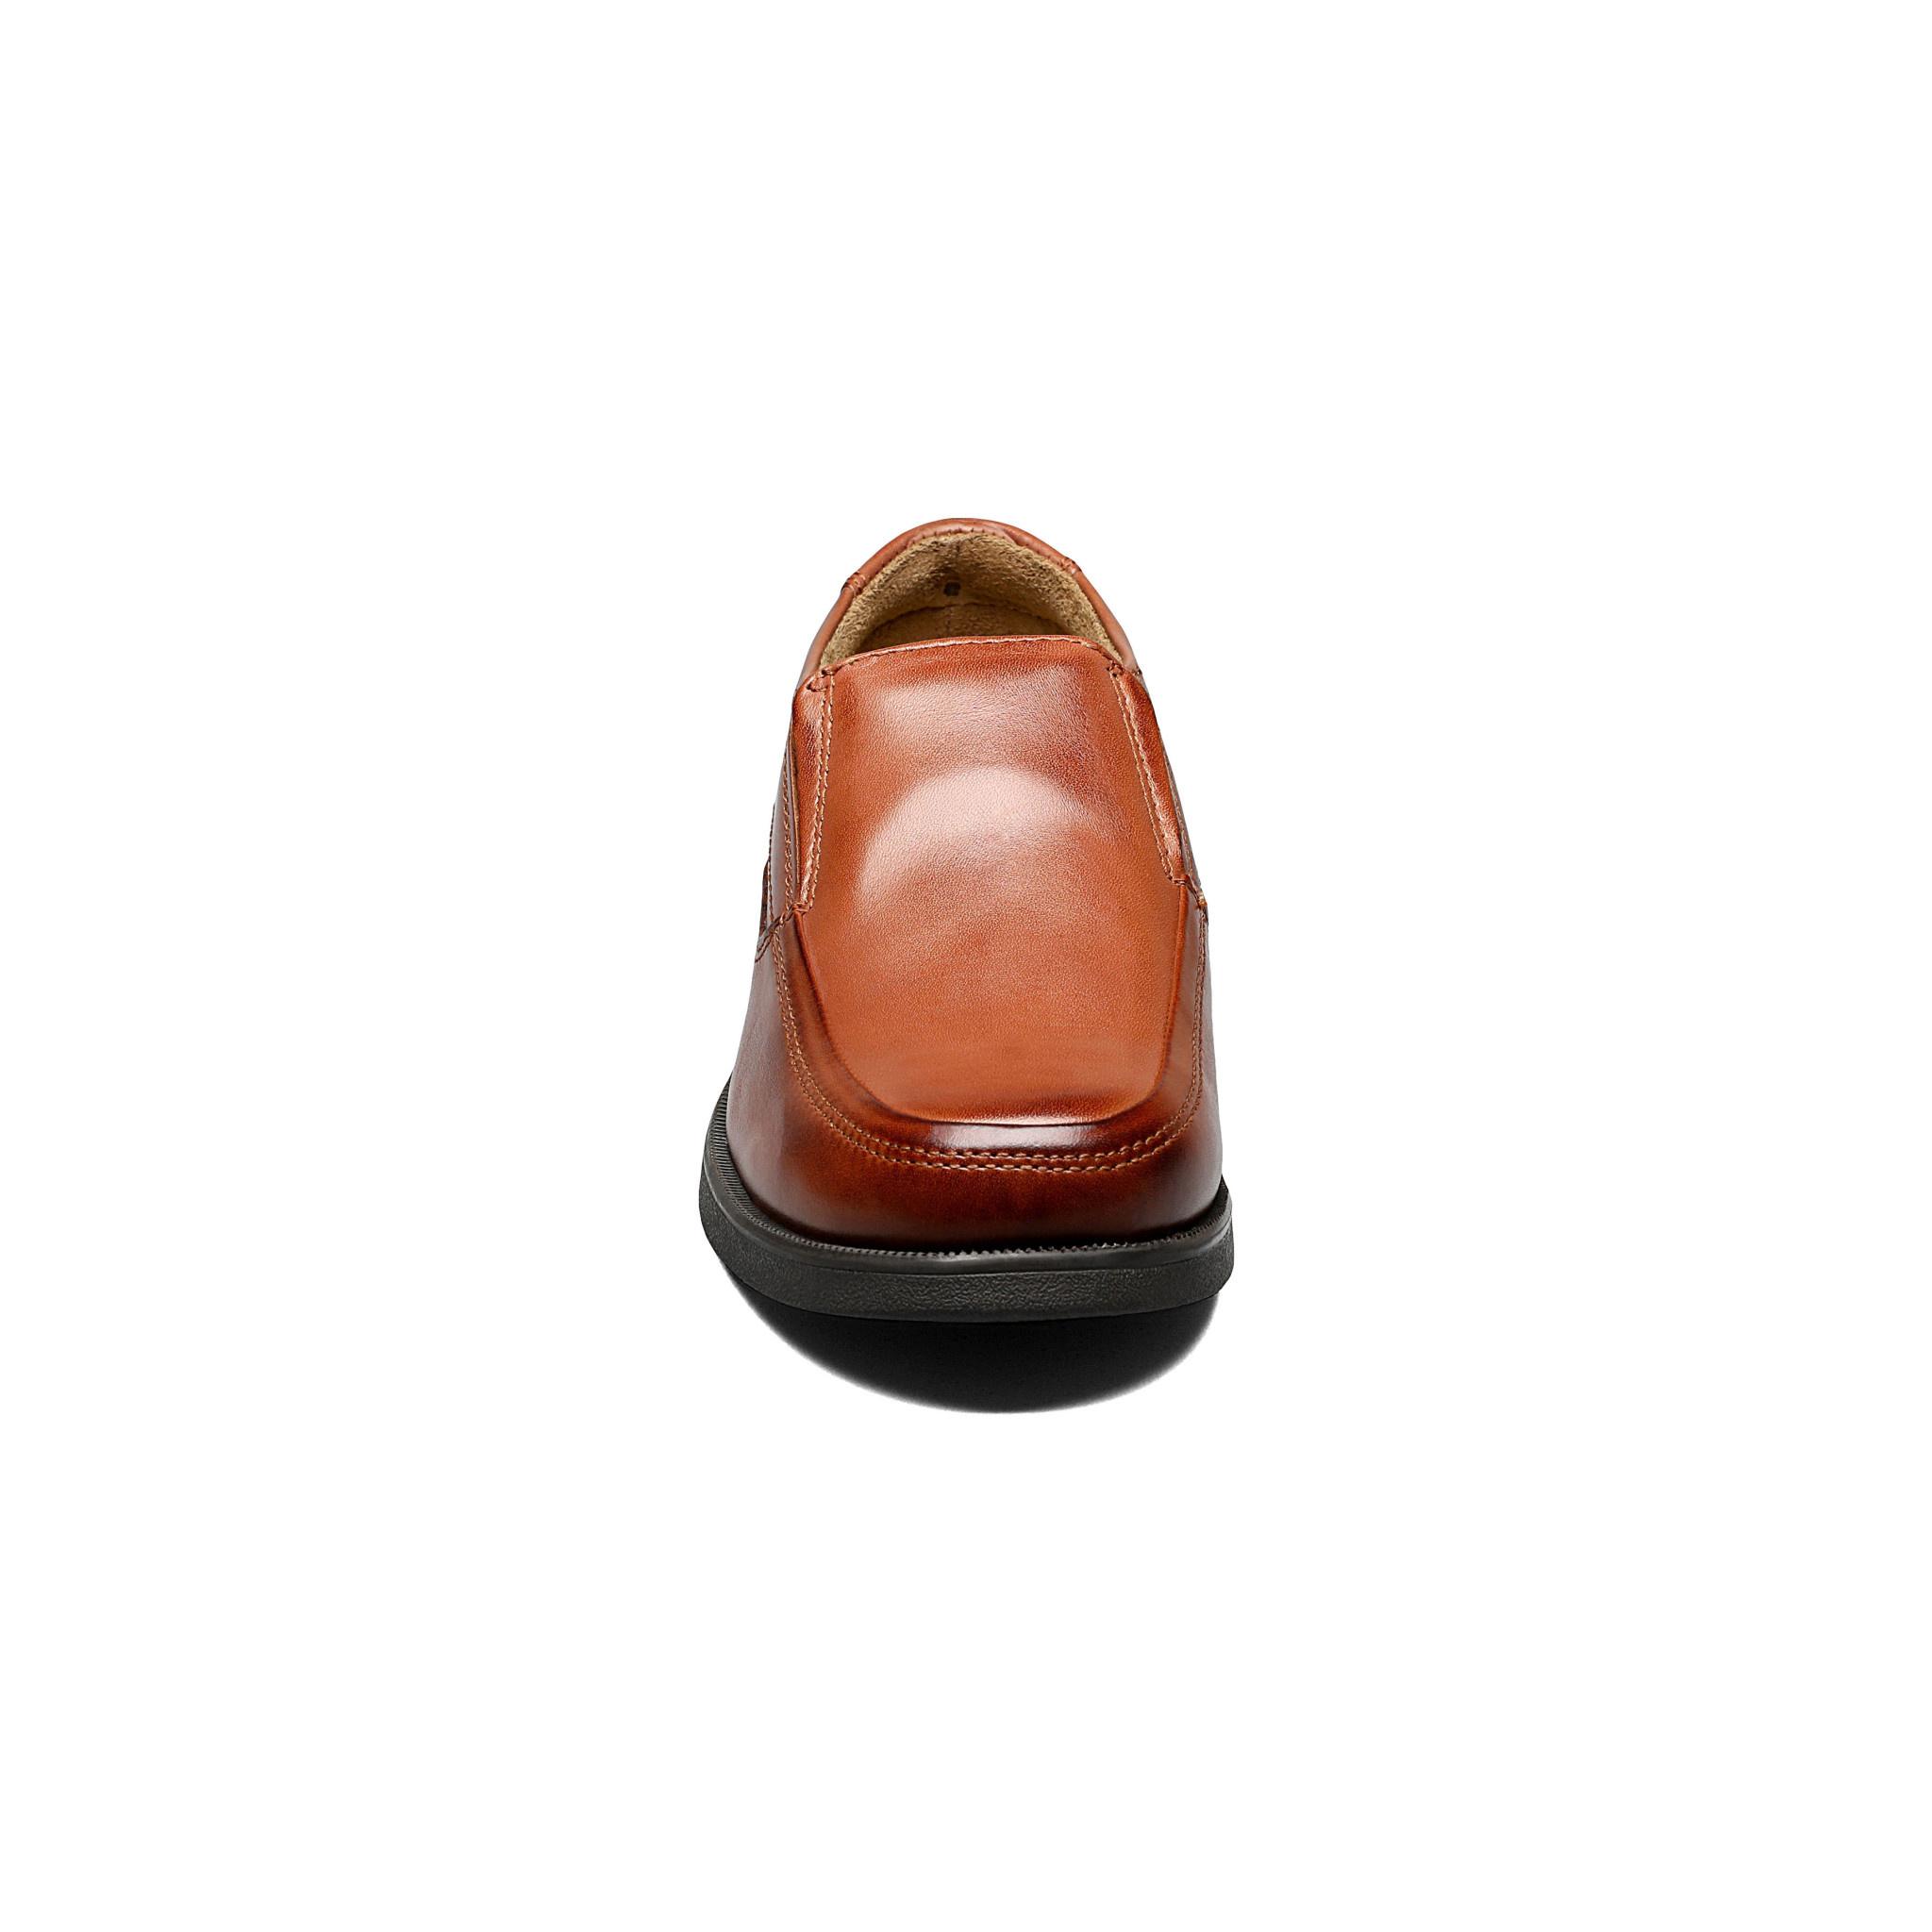 Boys Cognac Slip-On Dress Shoe with Wider Toe